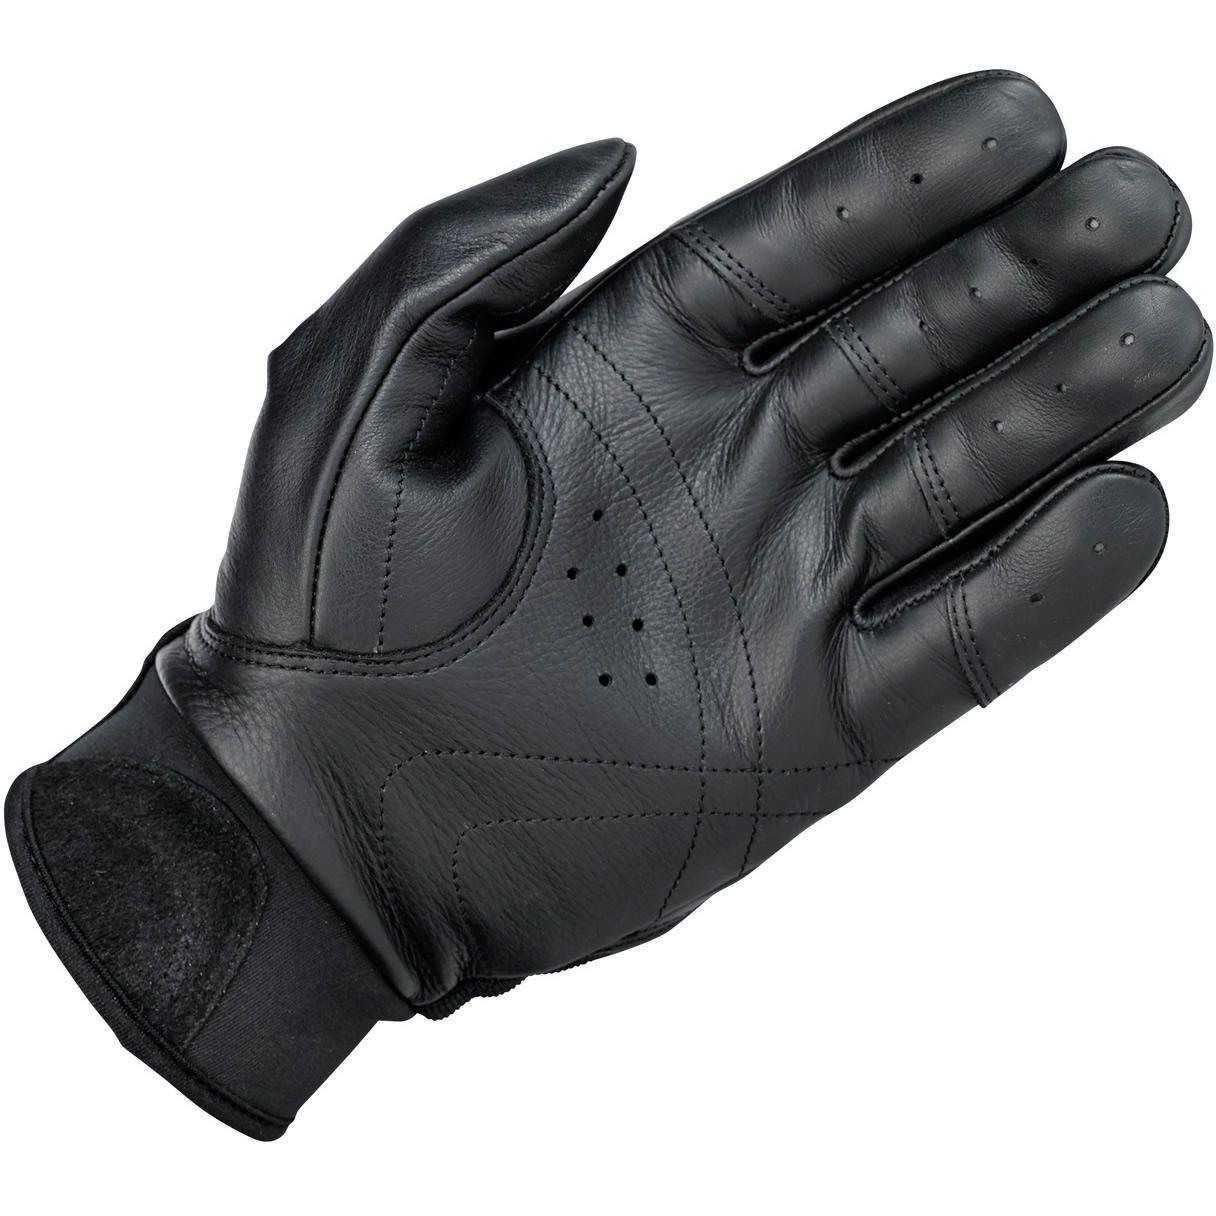 Motorcycle gloves cruiser - Thumb